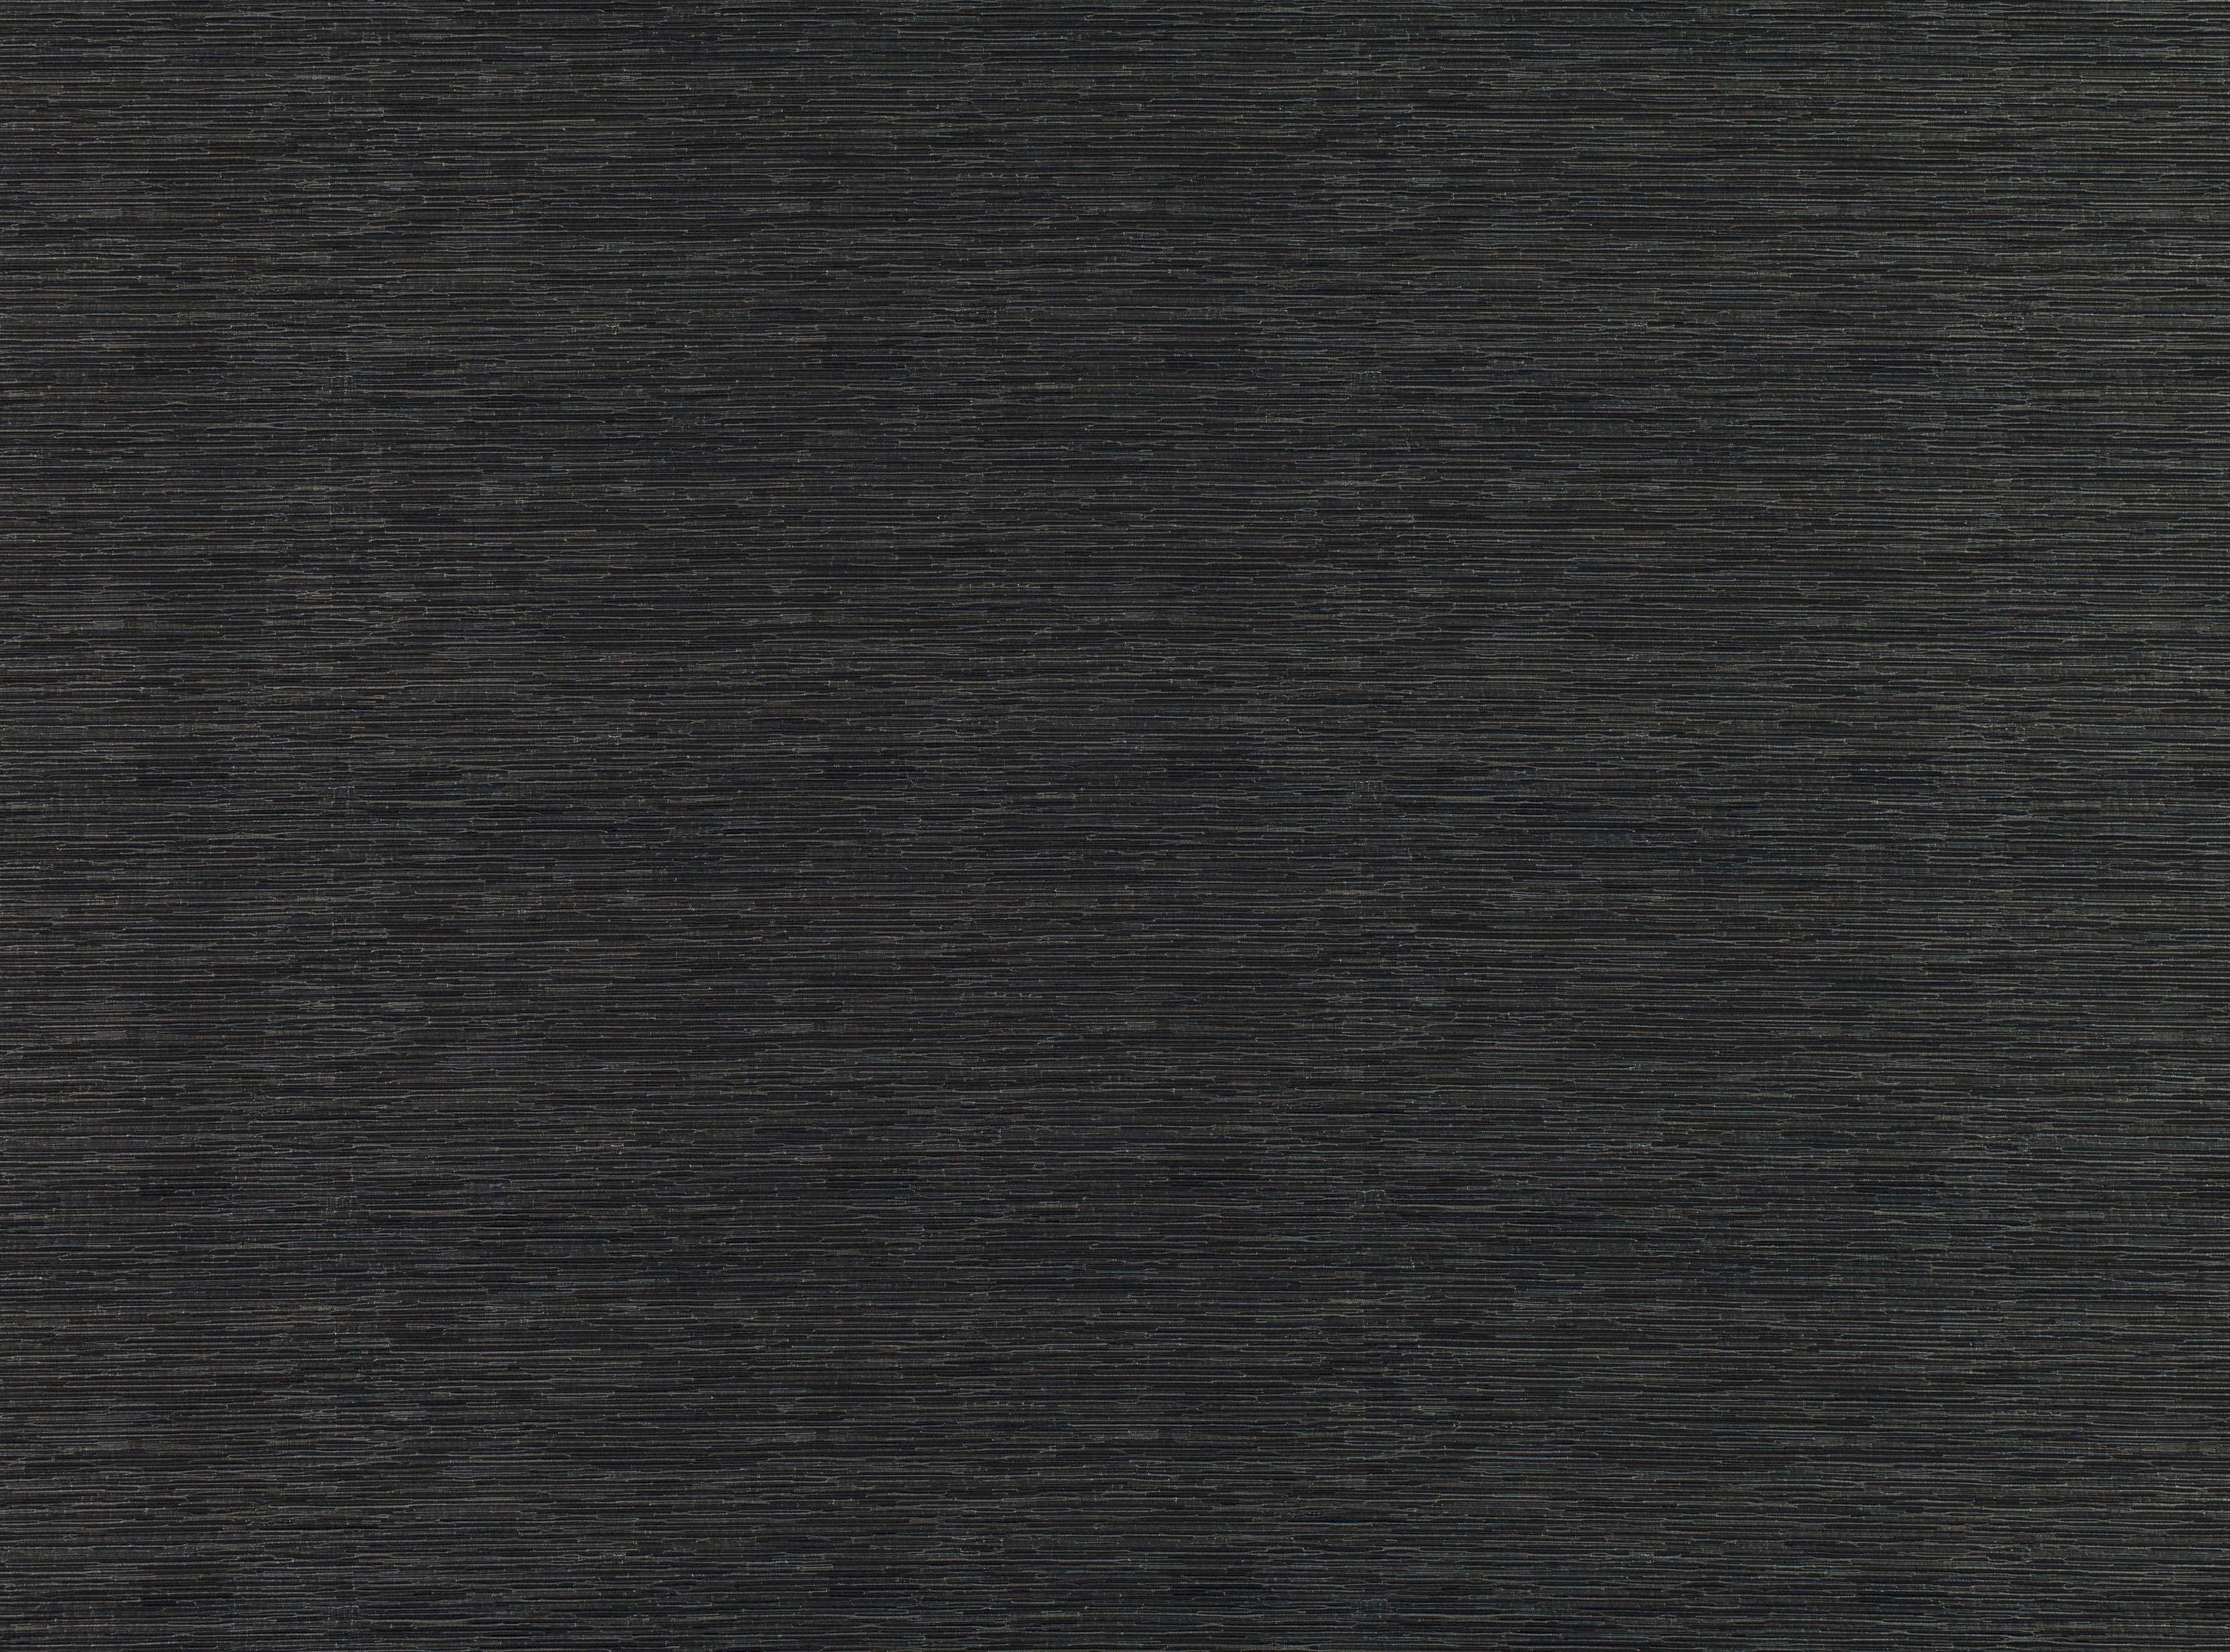 7676/01